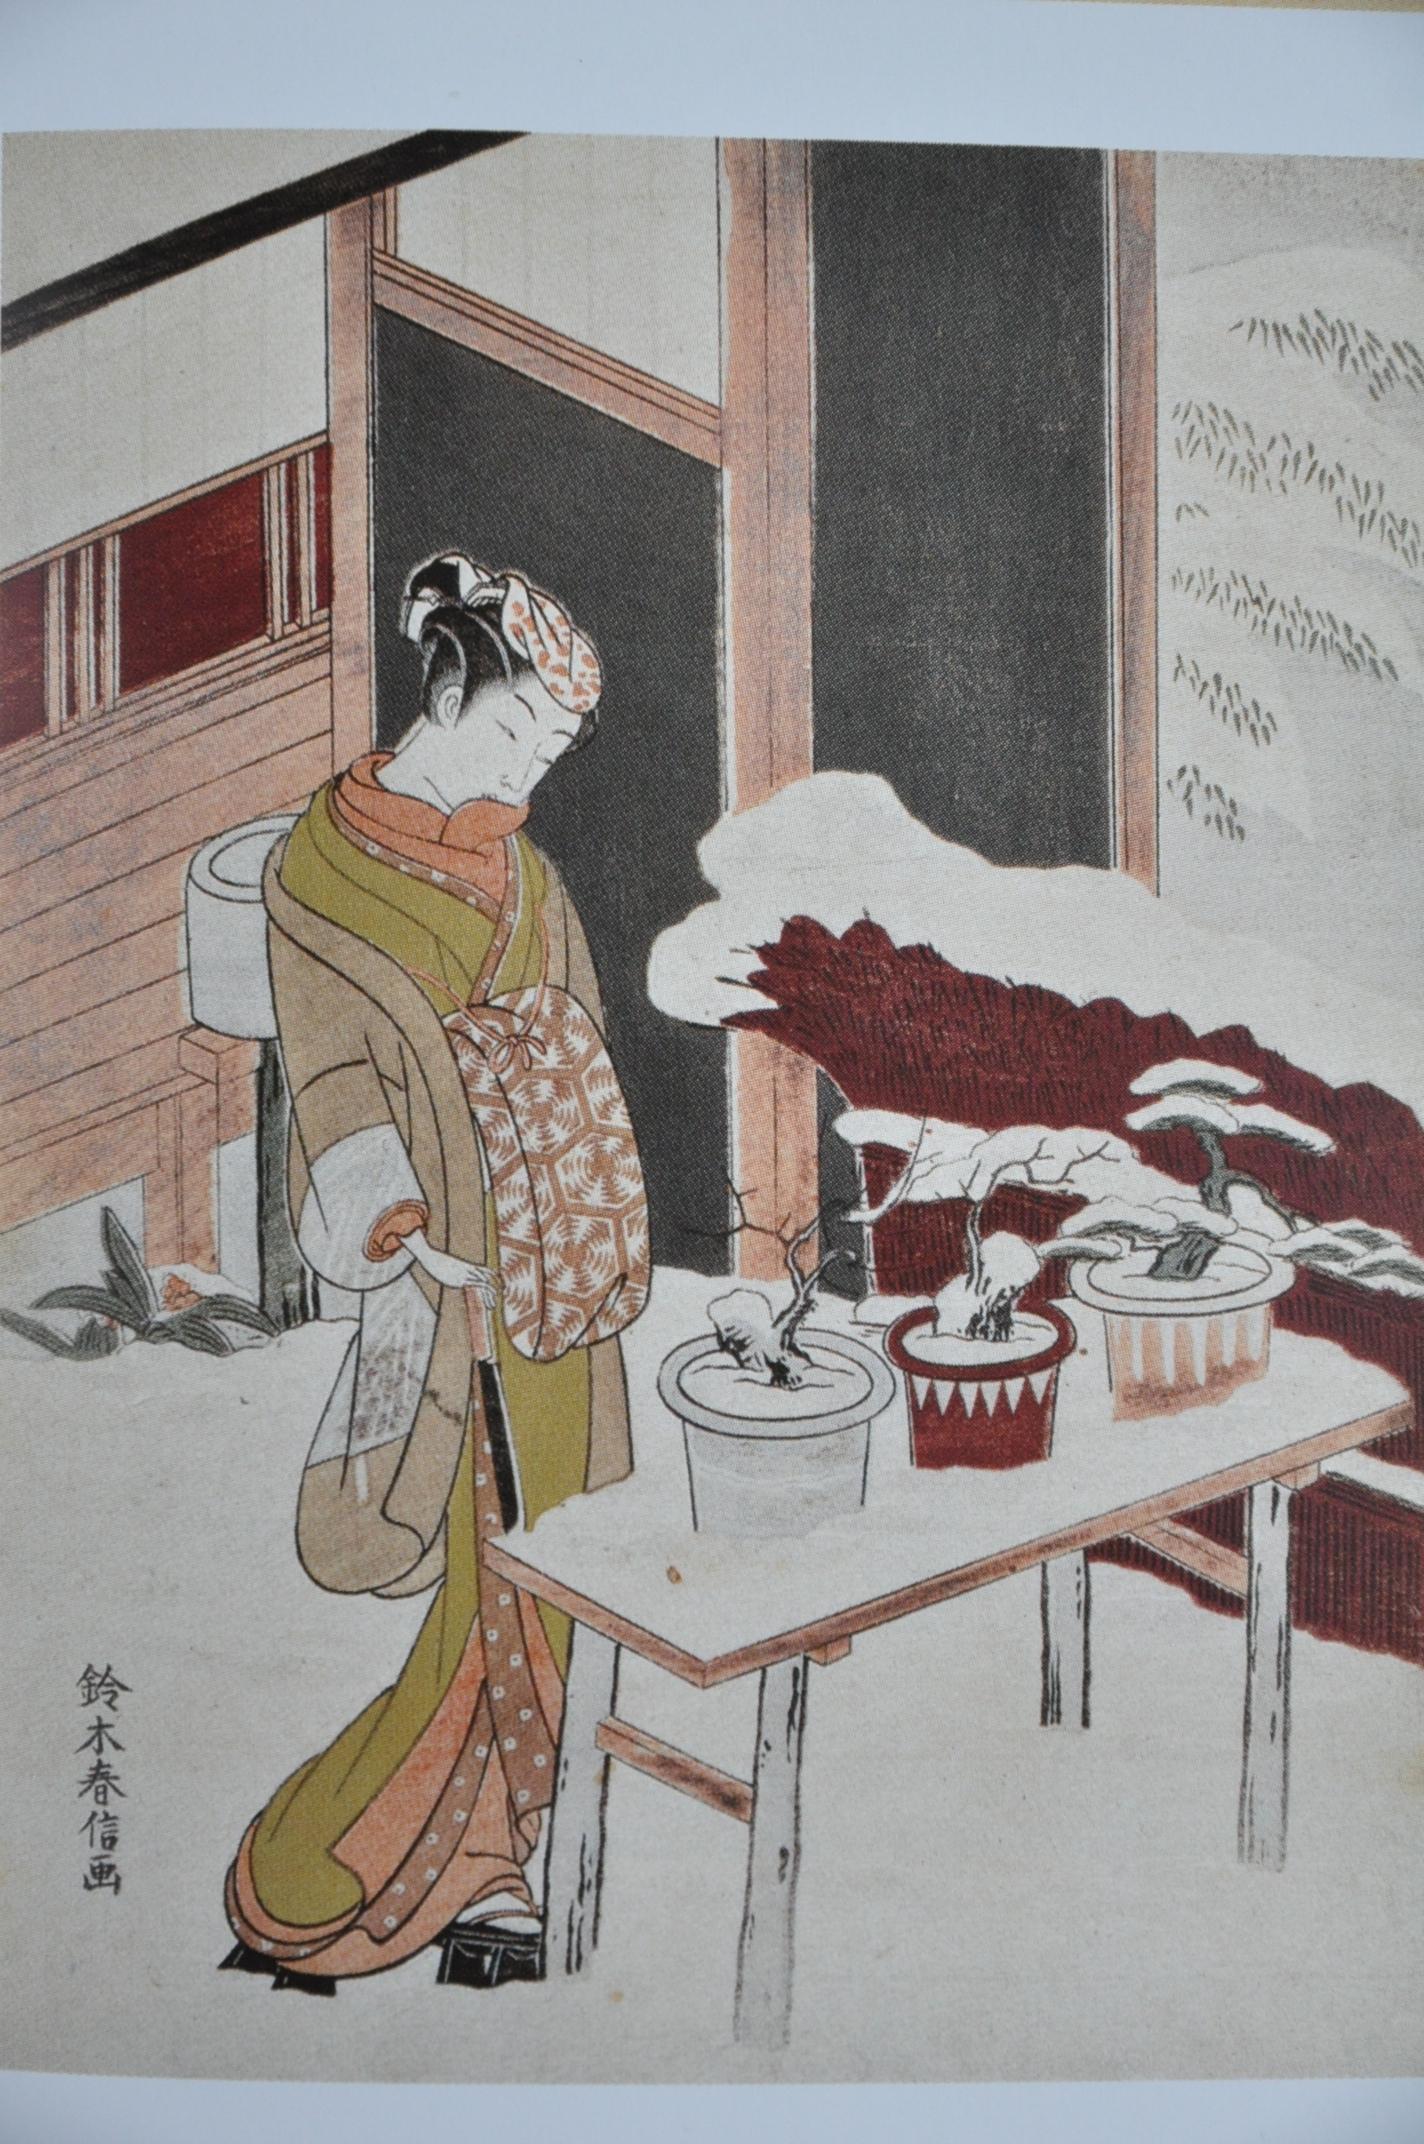 1000 images about artist suzuki harunobu on pinterest - Arbre en pot ...